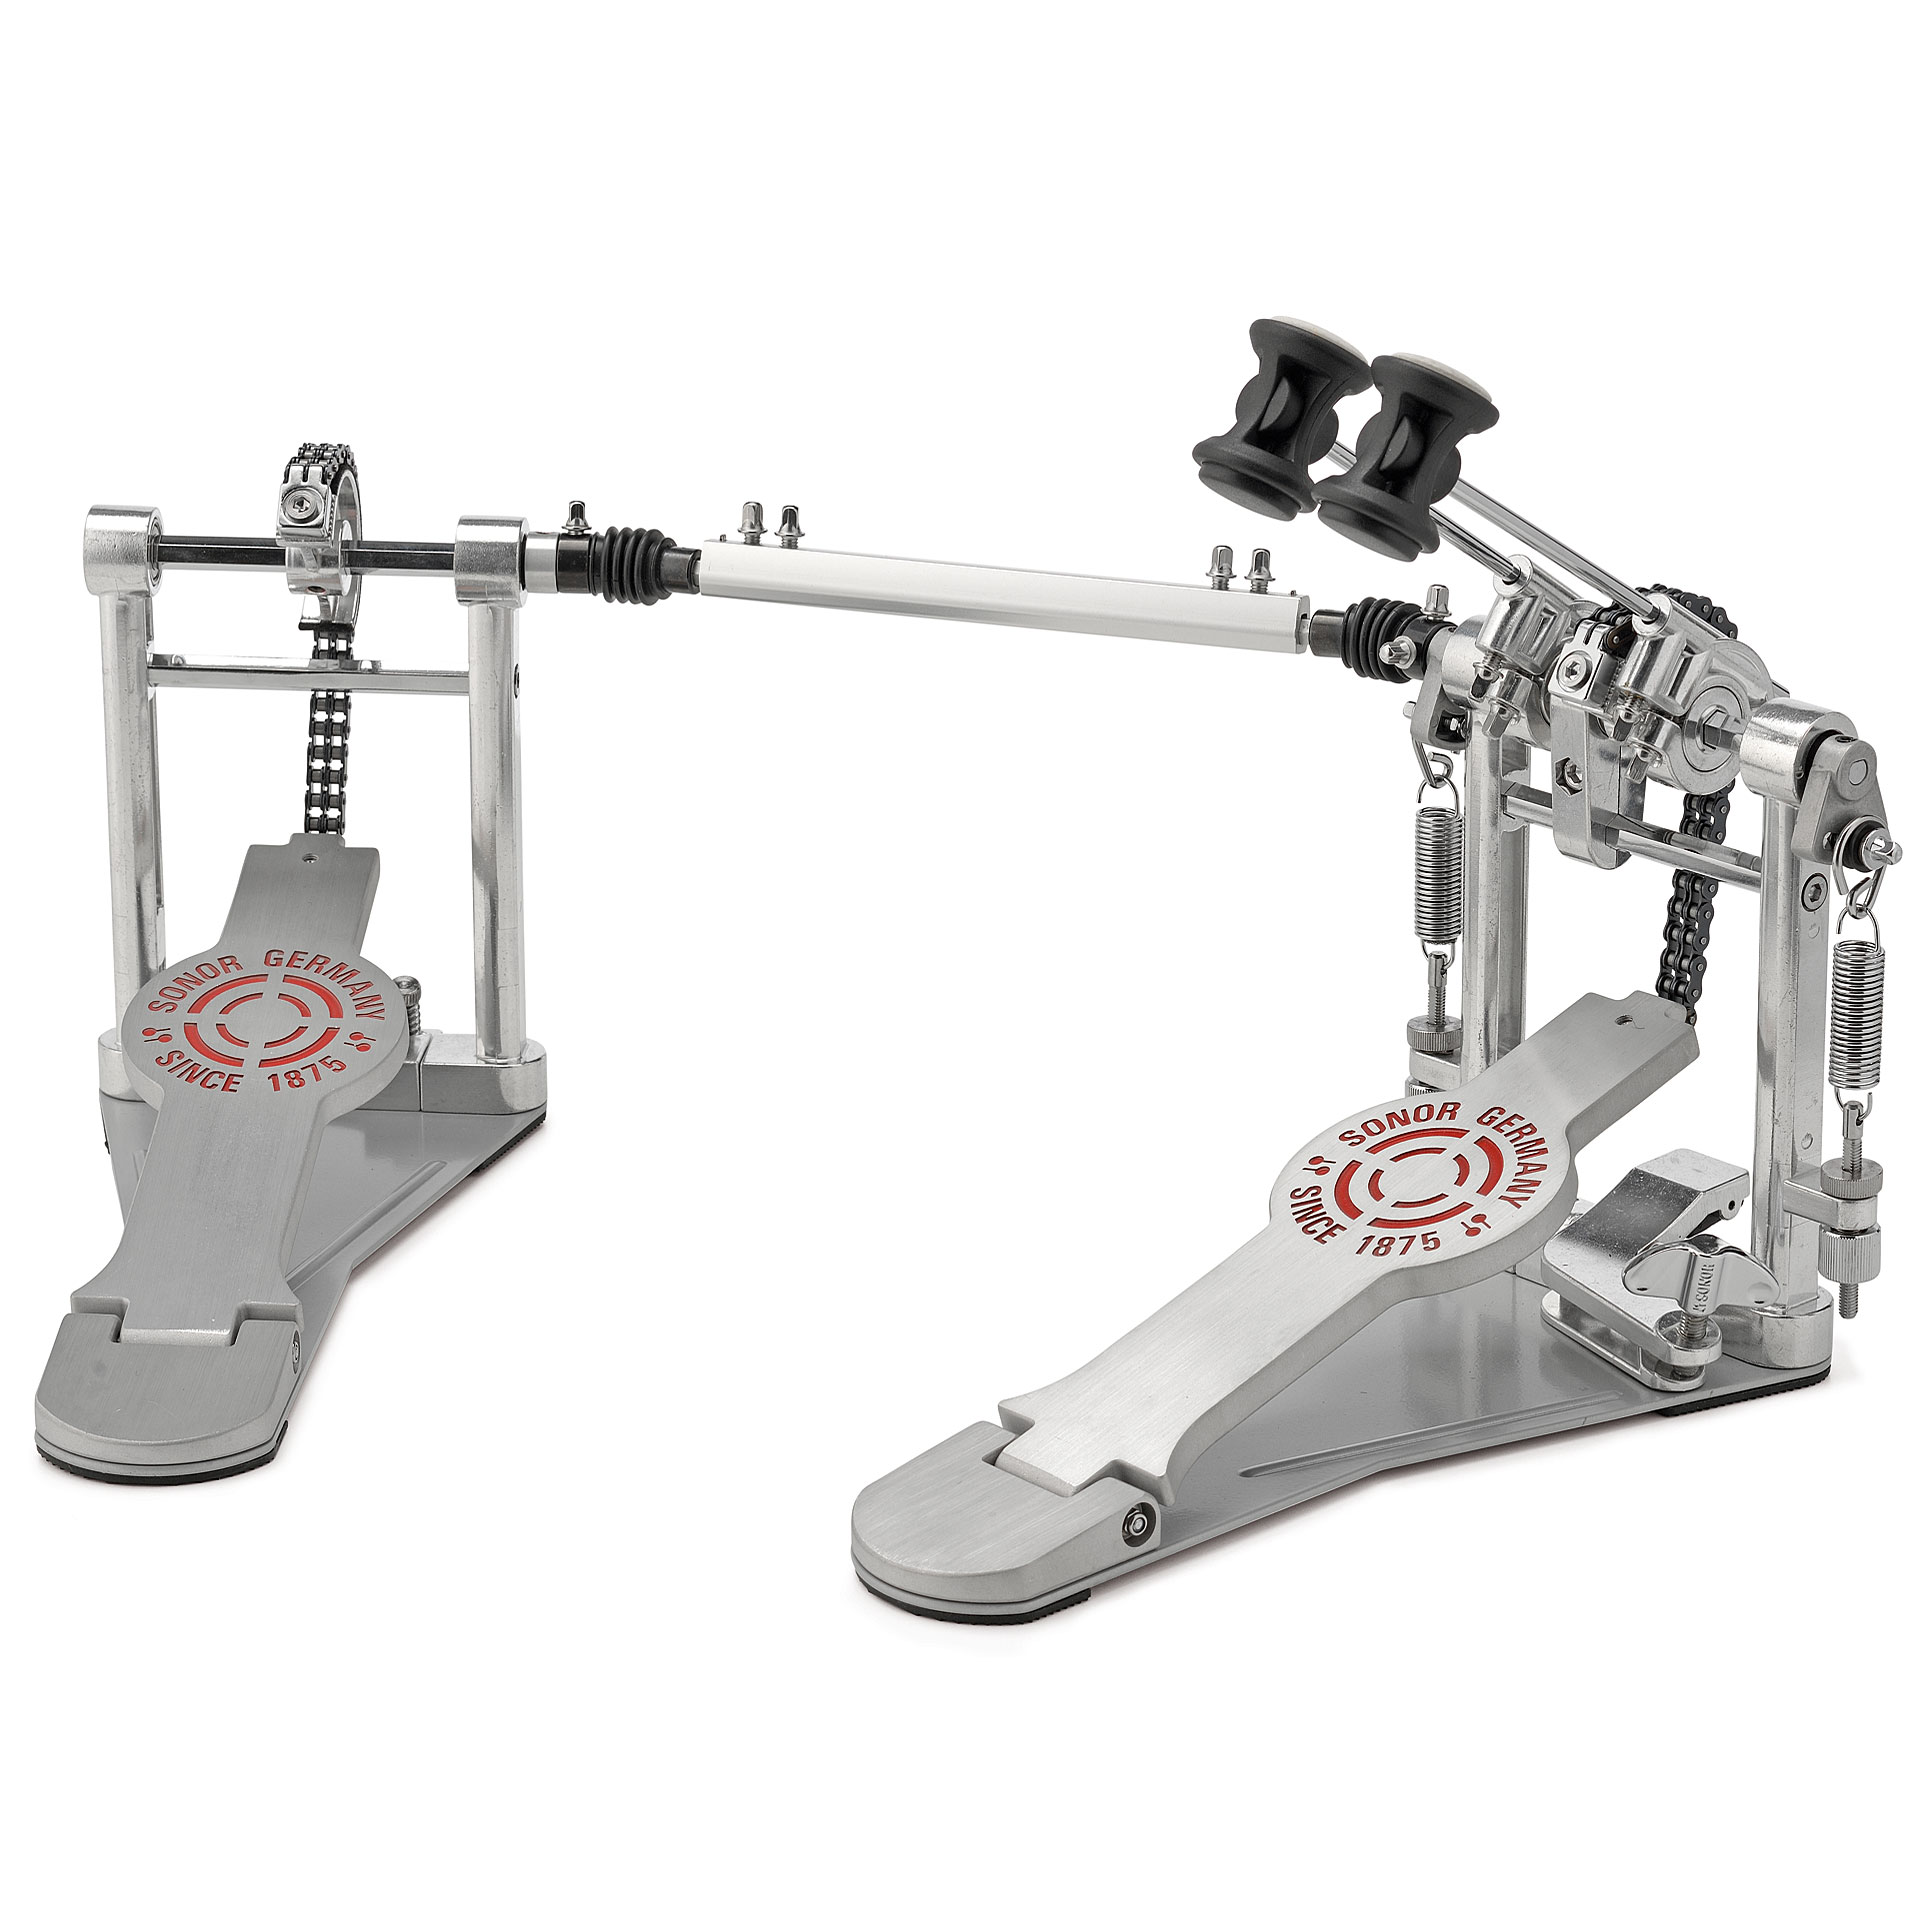 Sonor 4000 Double Pedal 171 Bassdrum Pedal